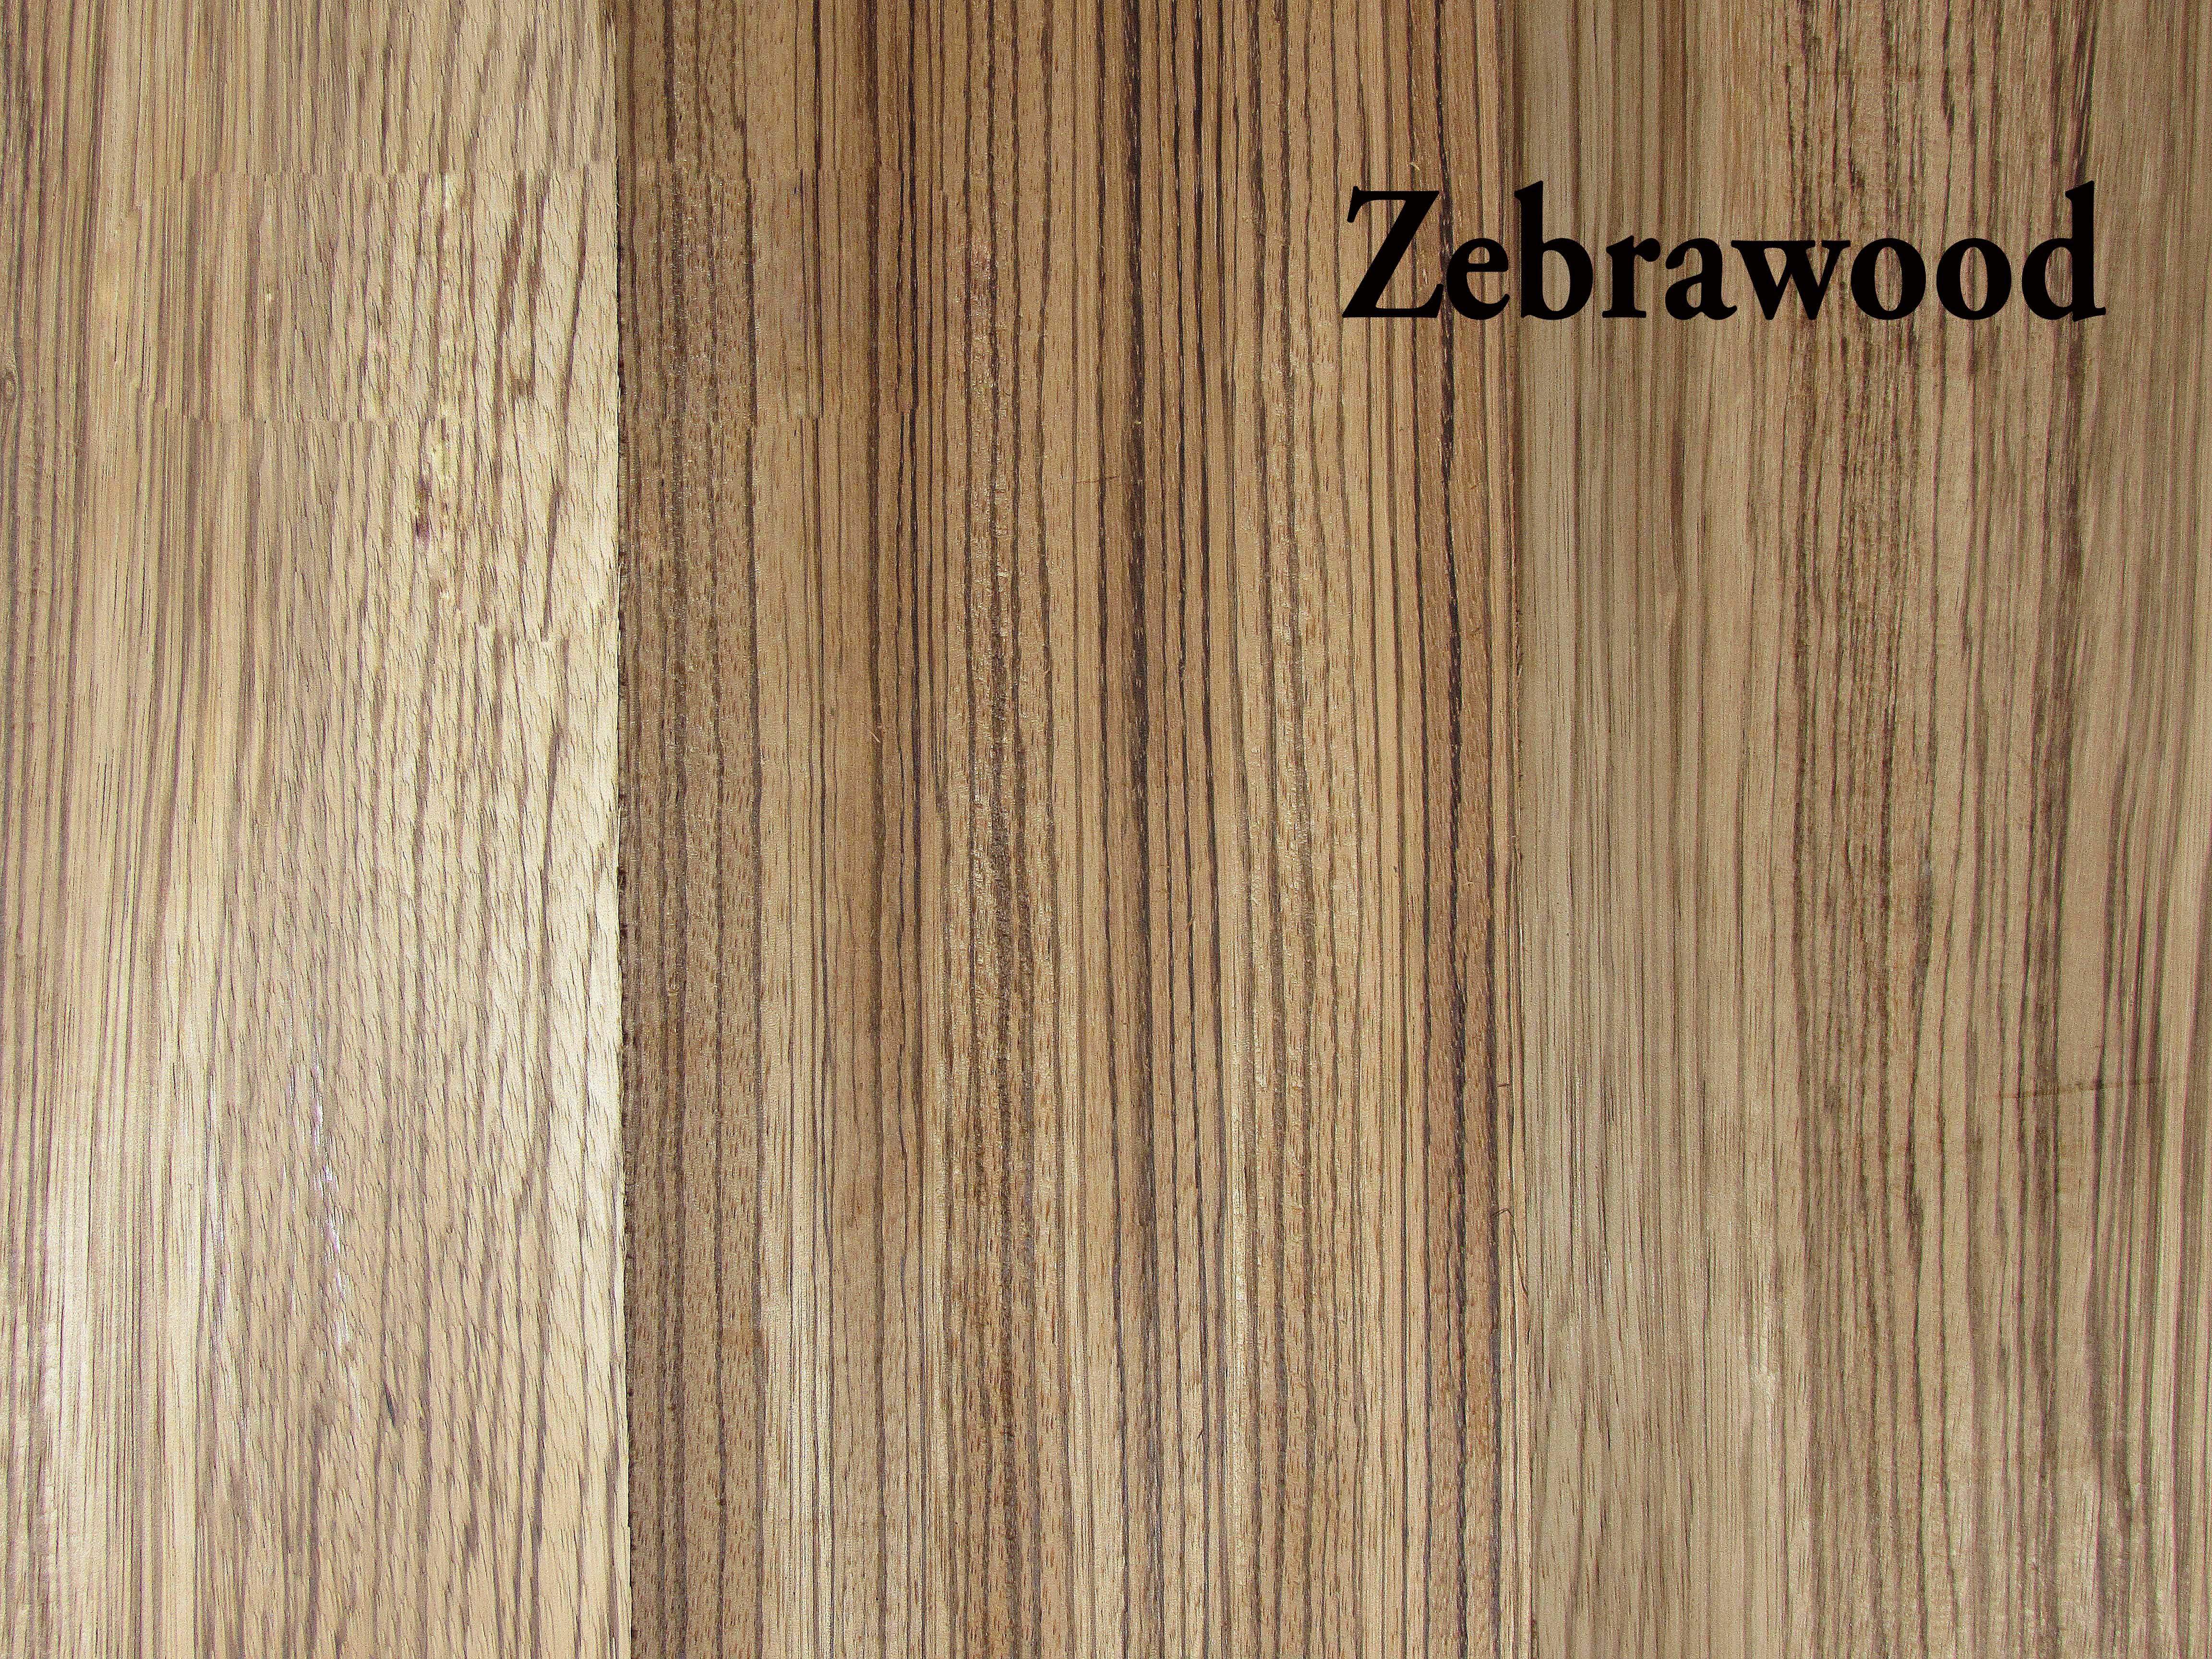 zebrawood vertical hardwood s2s capitol city lumber